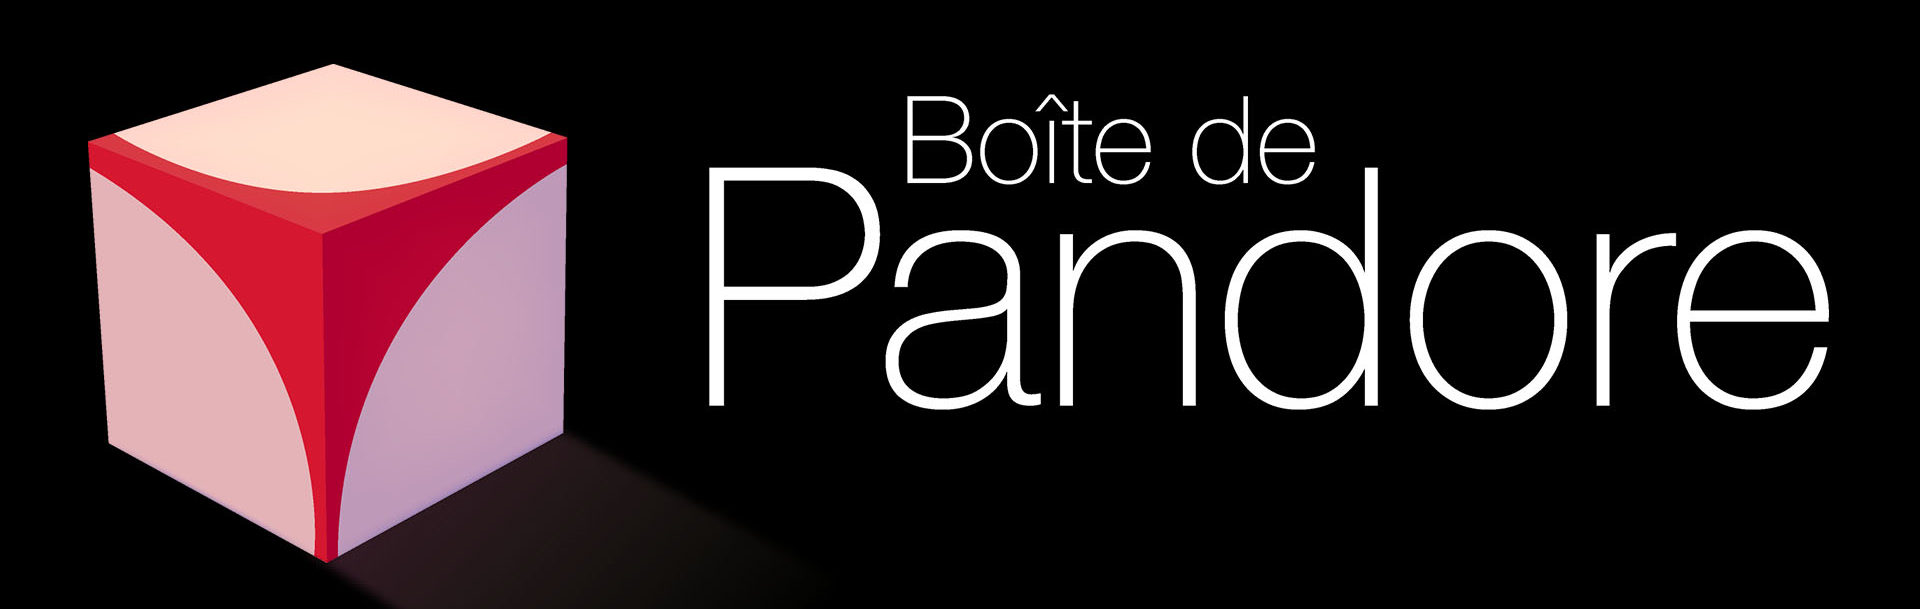 Logo Boite de Pandore